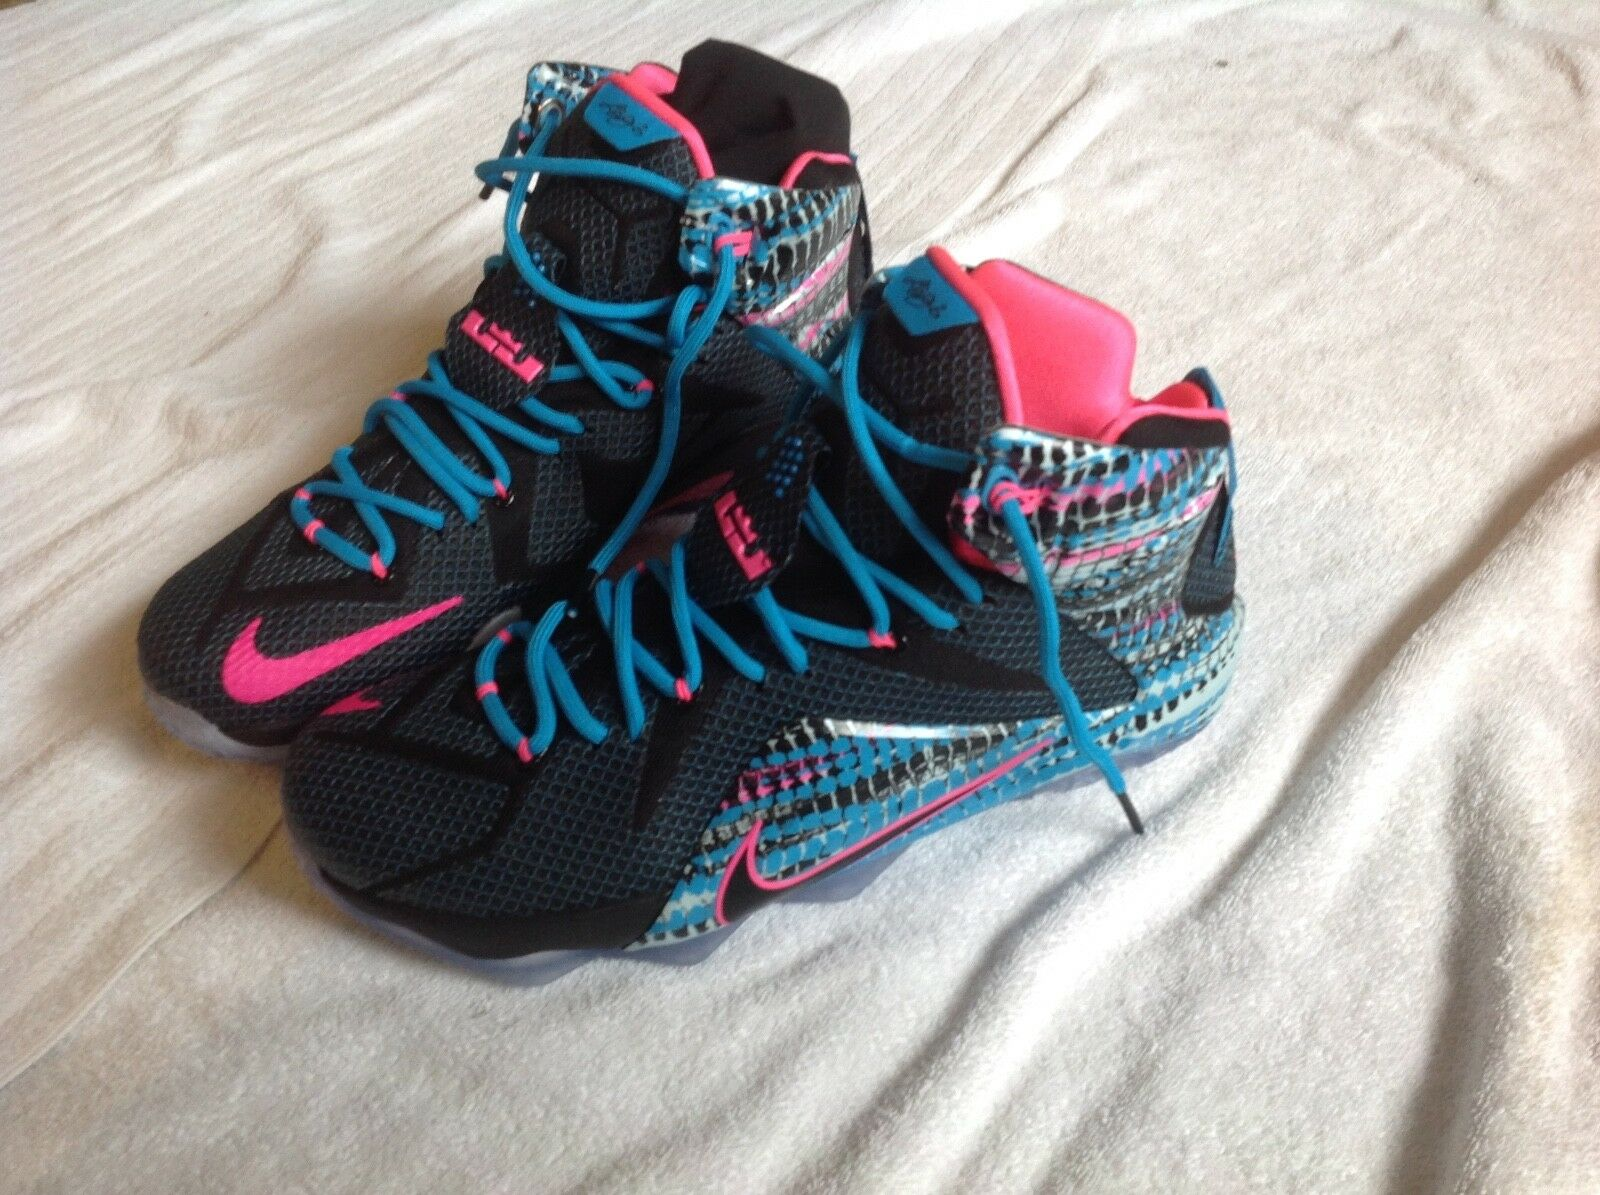 Lebron 12  684593 006 nike basketball shoes size 11  free Nike Socks